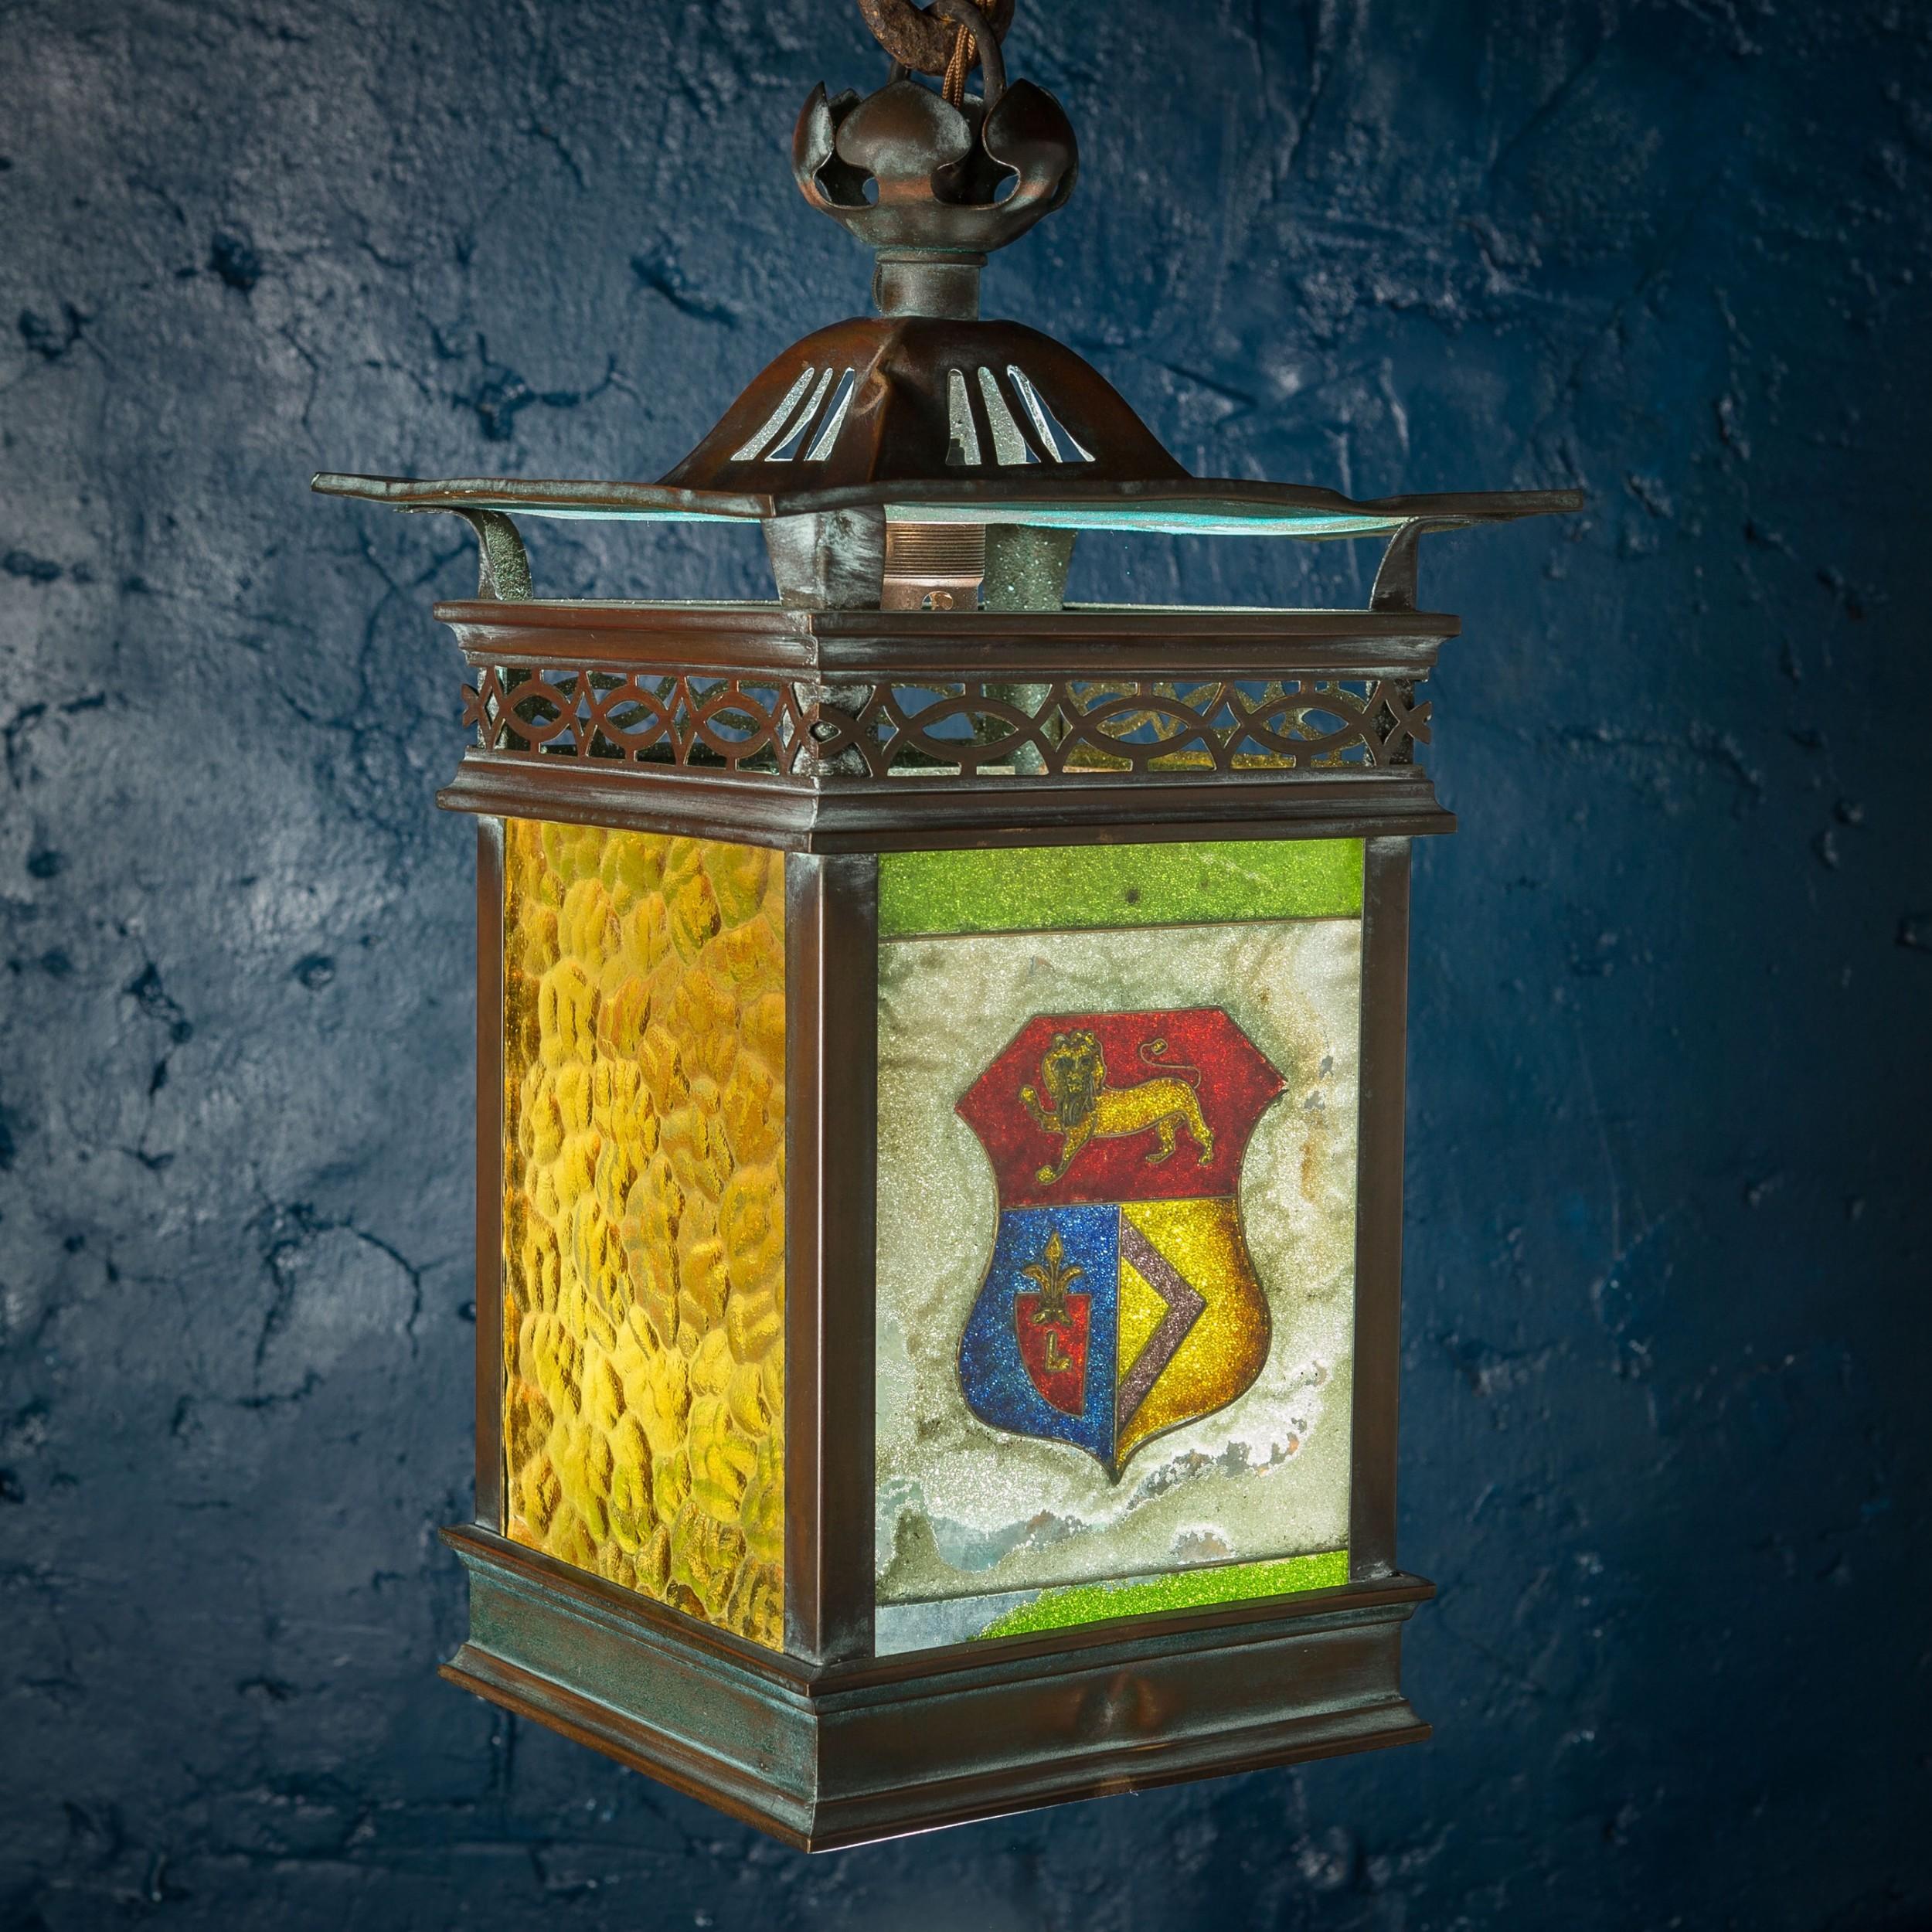 19th c arts crafts copper lantern with heraldic shield coloured glass